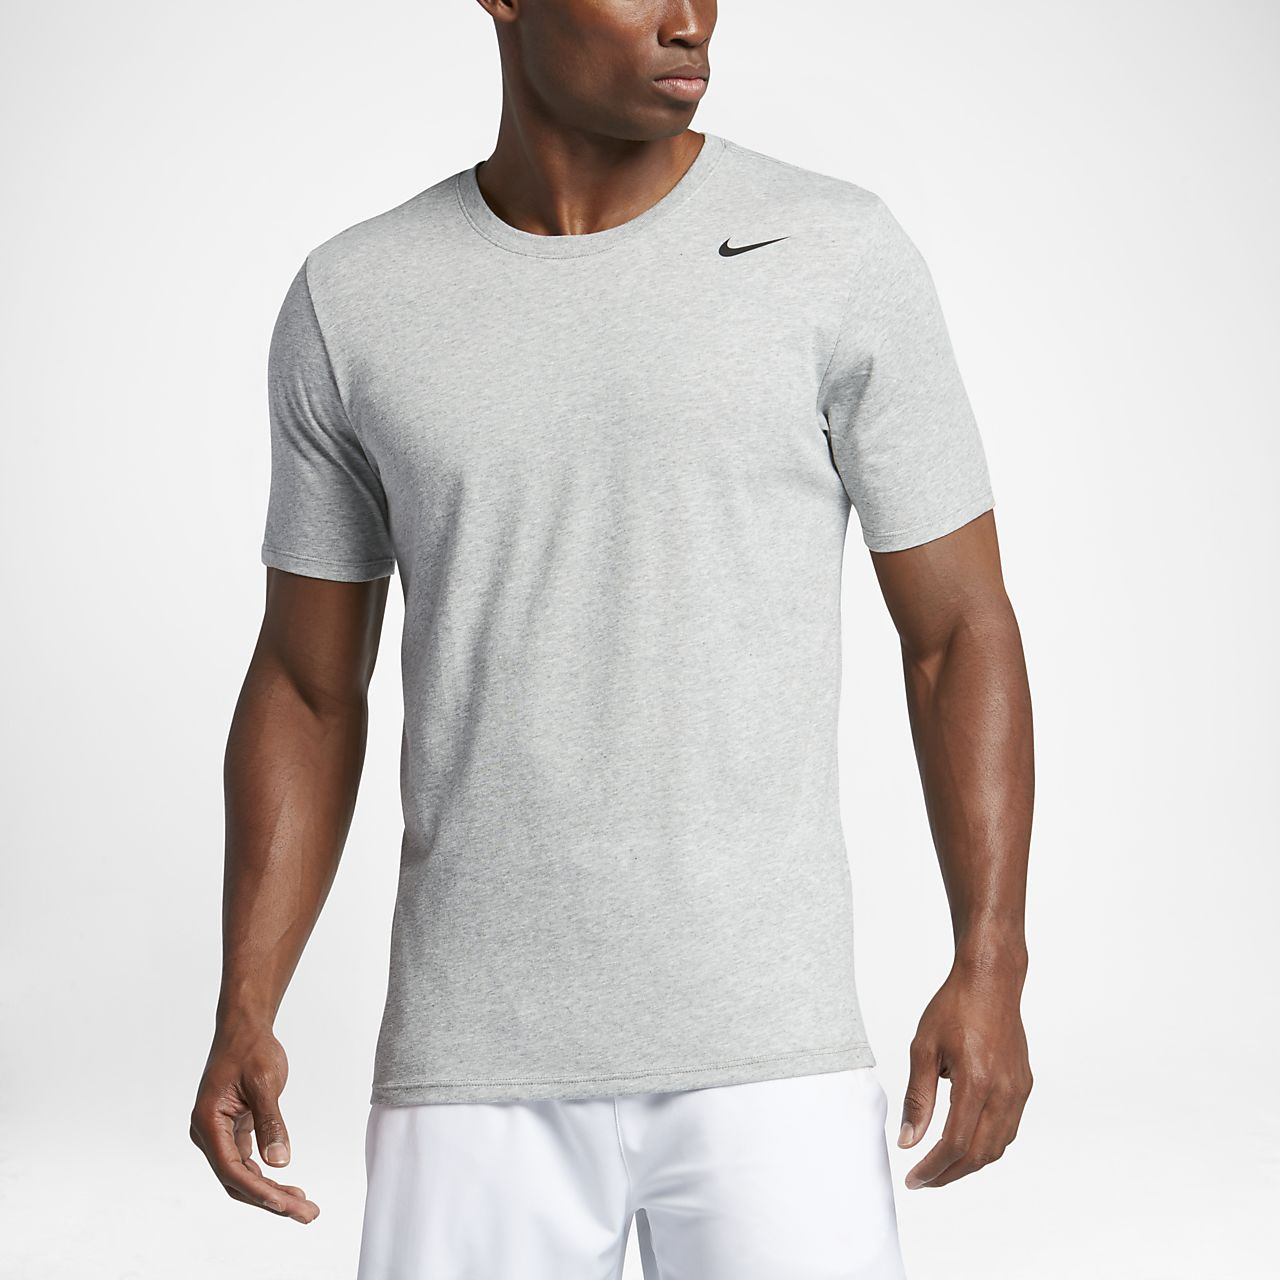 4bc3b5c1f Nike Dri-FIT Camiseta de entrenamiento de manga corta - Hombre. Nike ...